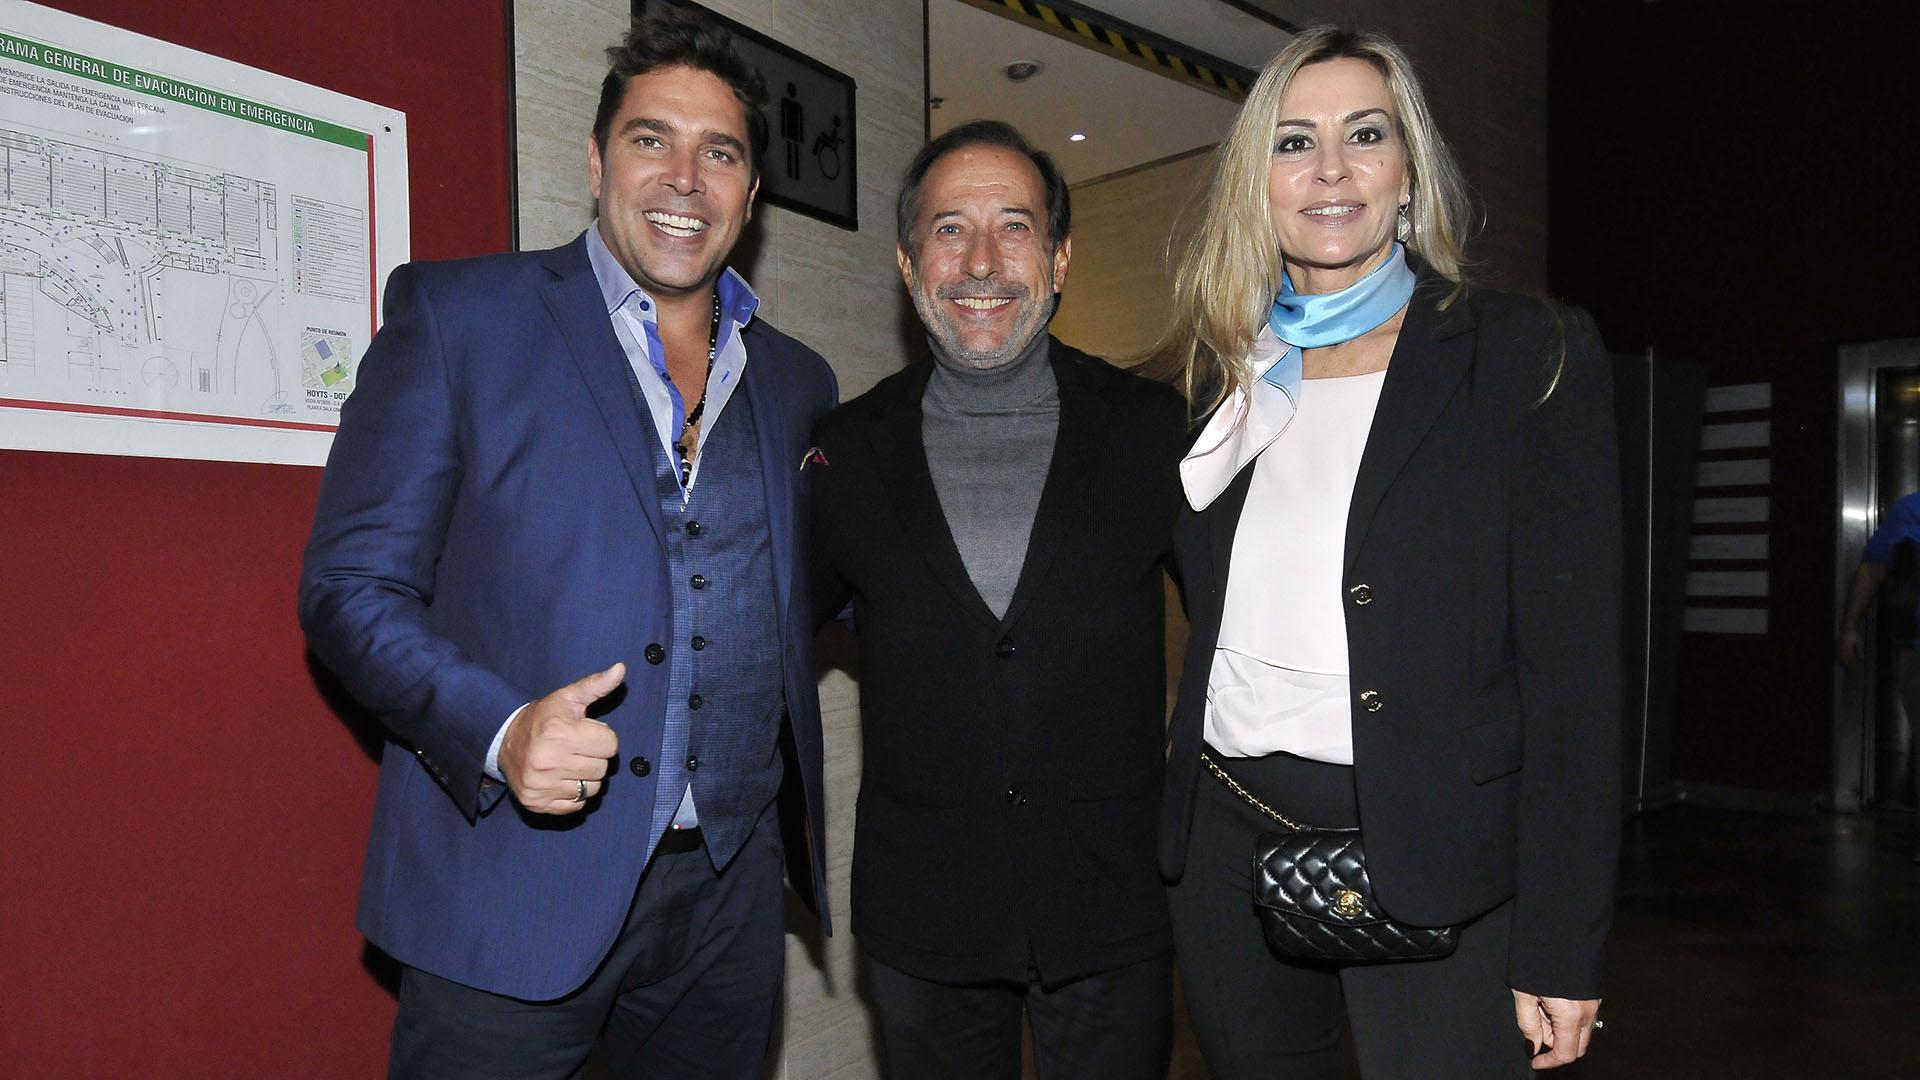 Matías Alé, Guillermo Francella y Marynés Breña